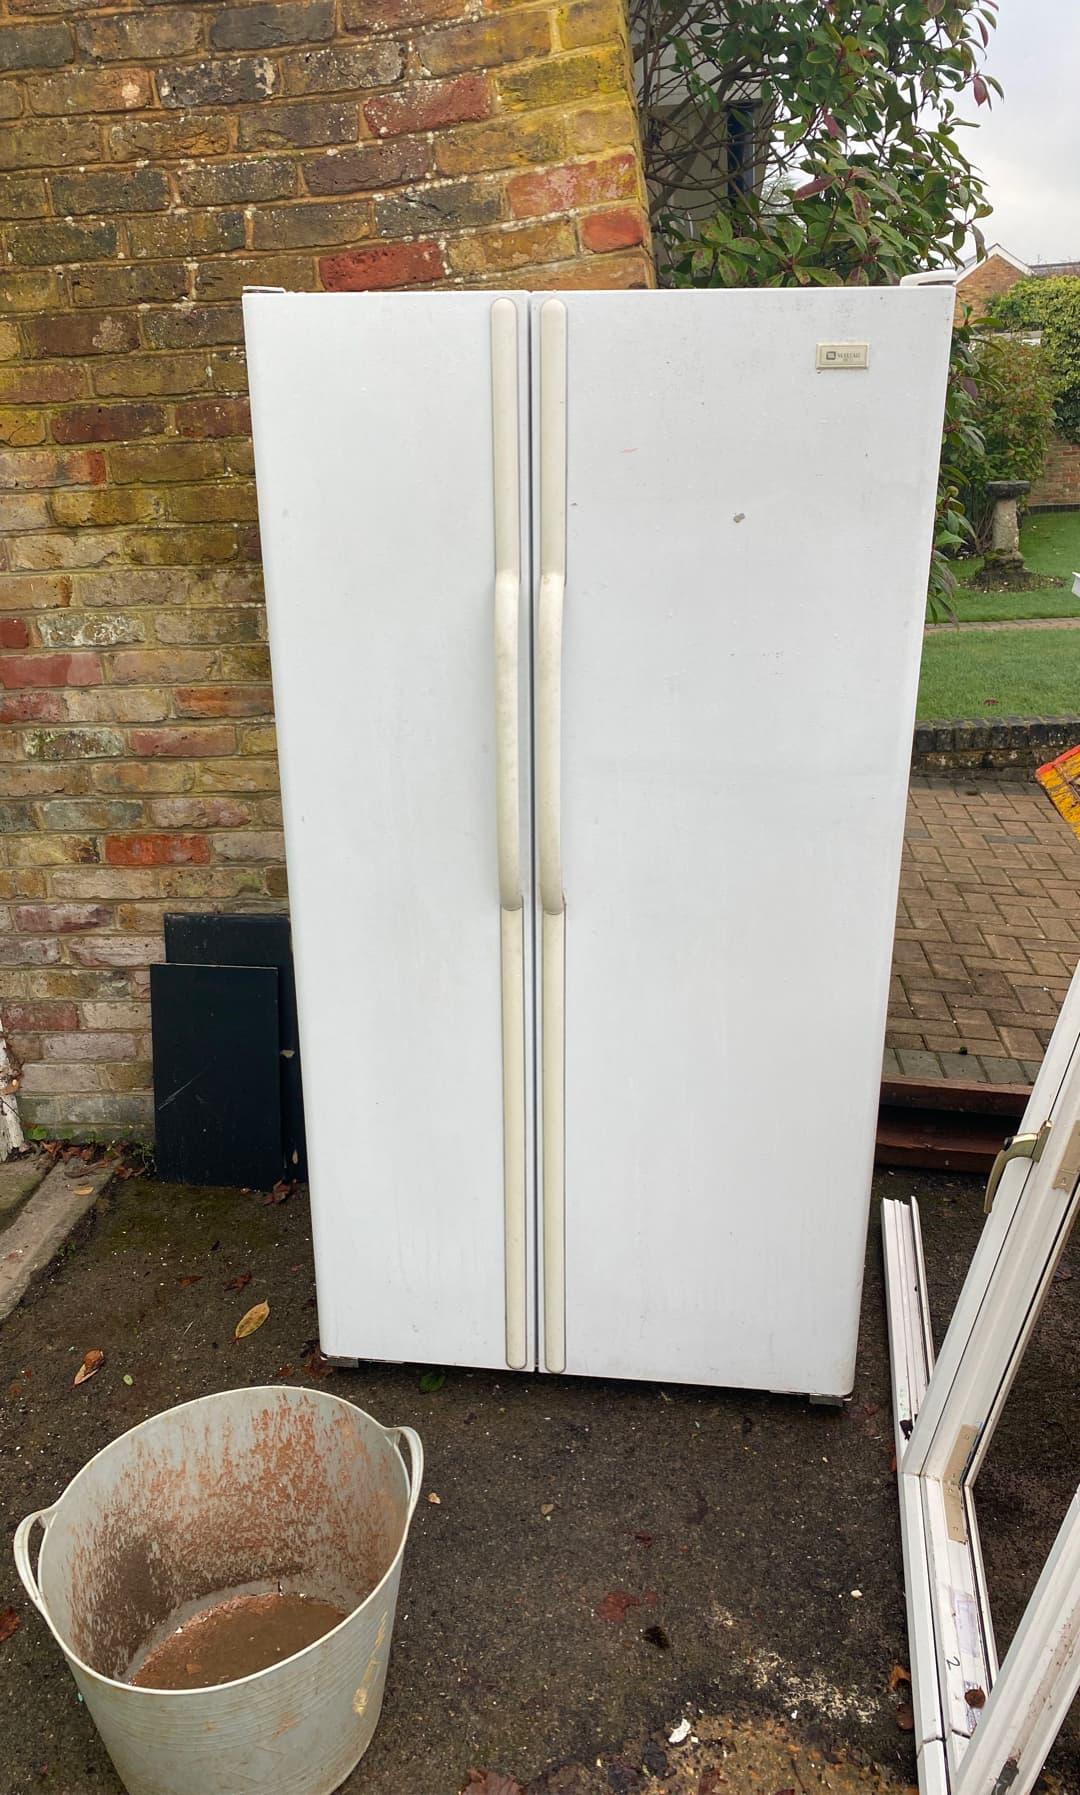 fridge disposal